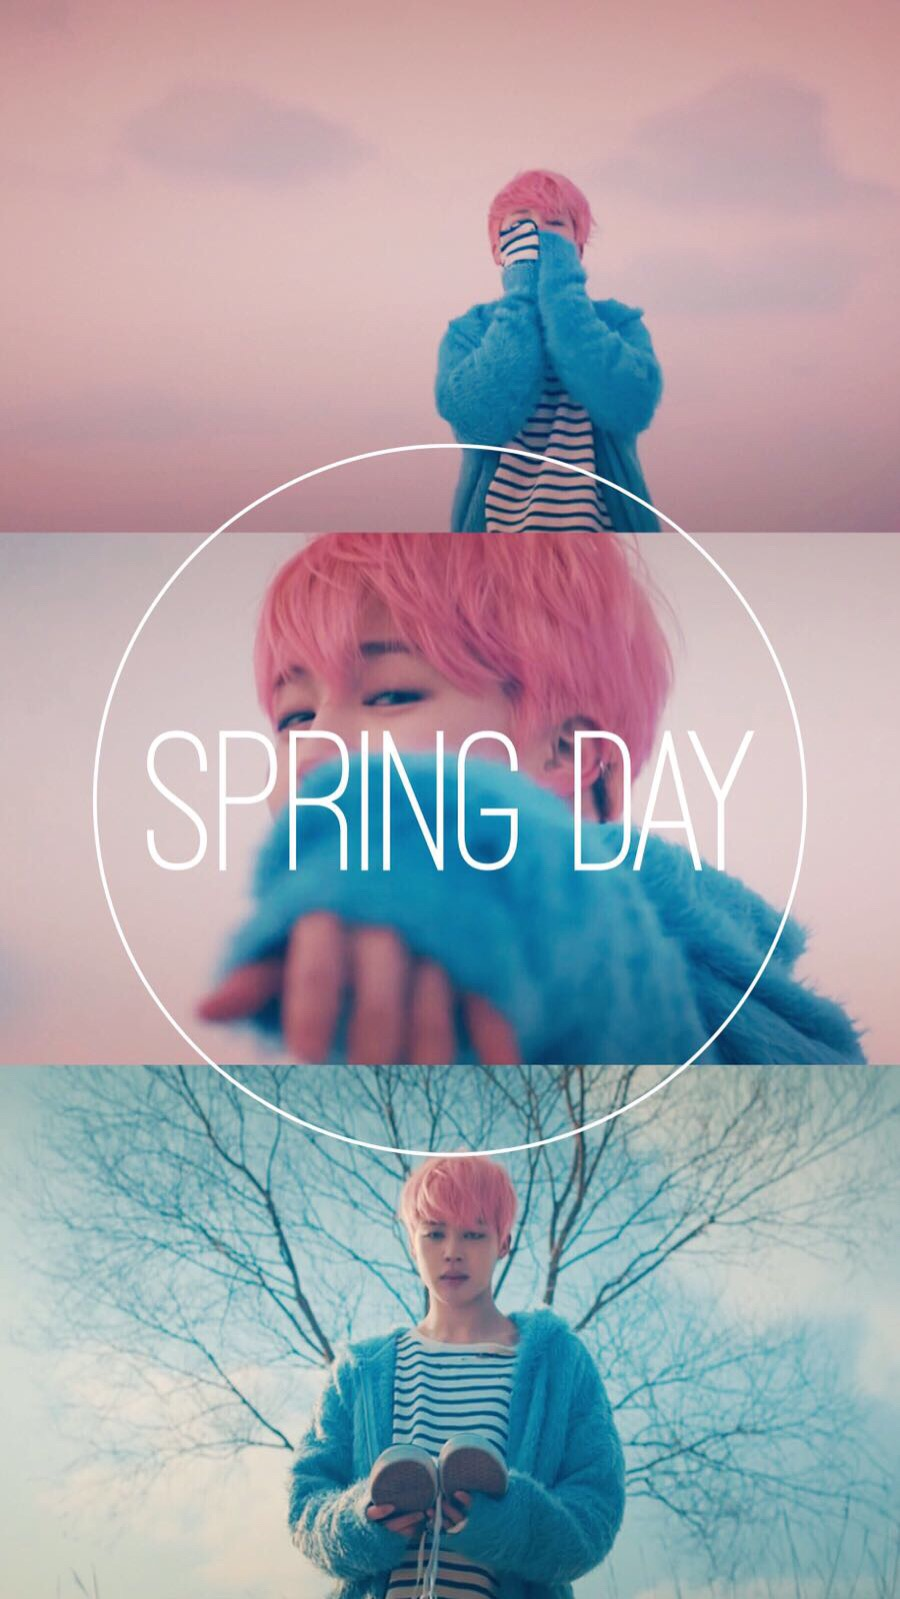 Bts Jimin Spring Day Iphone Wallpaper